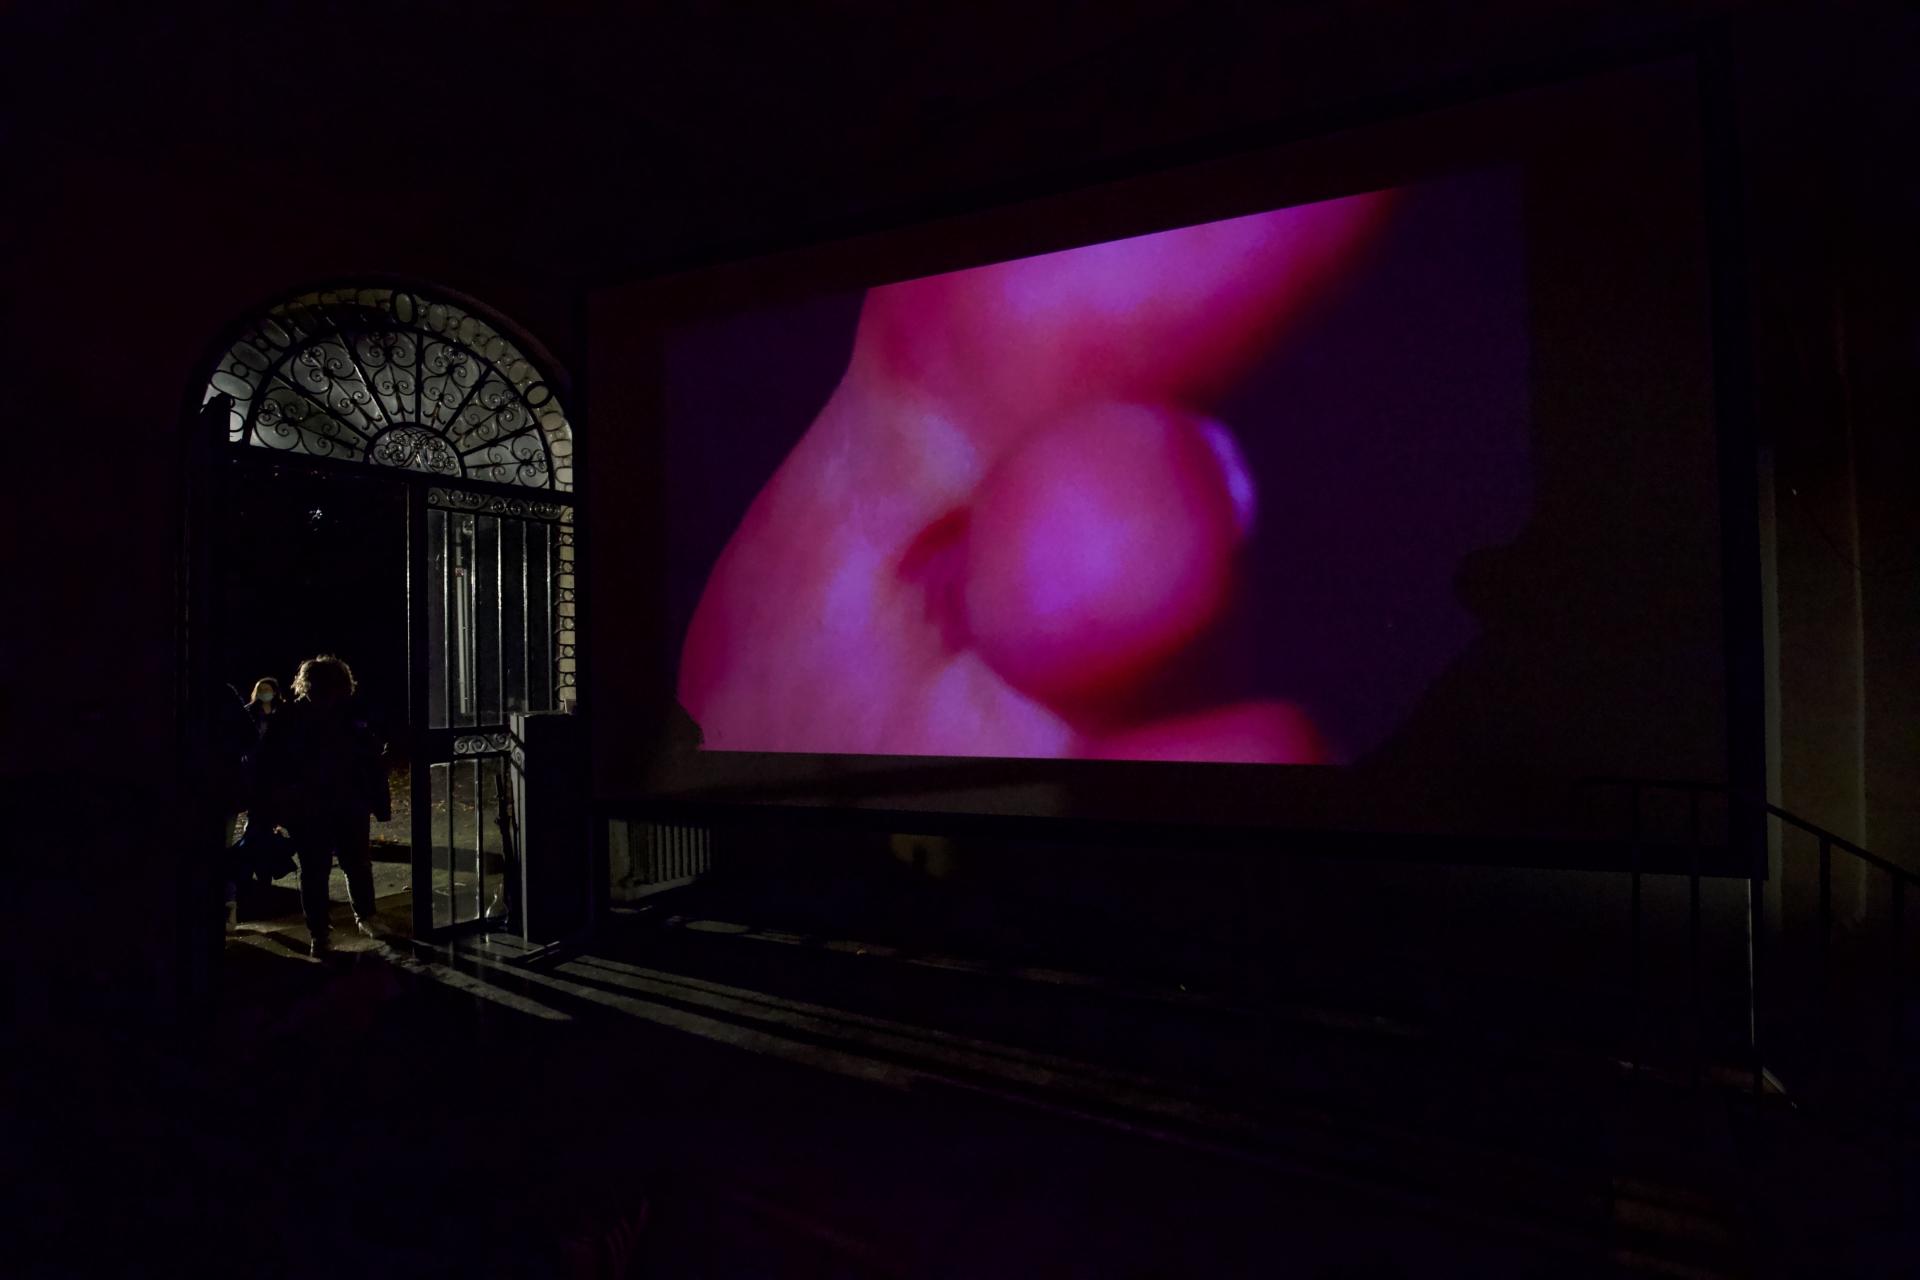 Programmation  vidéo, Nuit Blanche. Rachid - B1, 2017, Jonathan Martin. Crédit photo : Vanessa Silvera